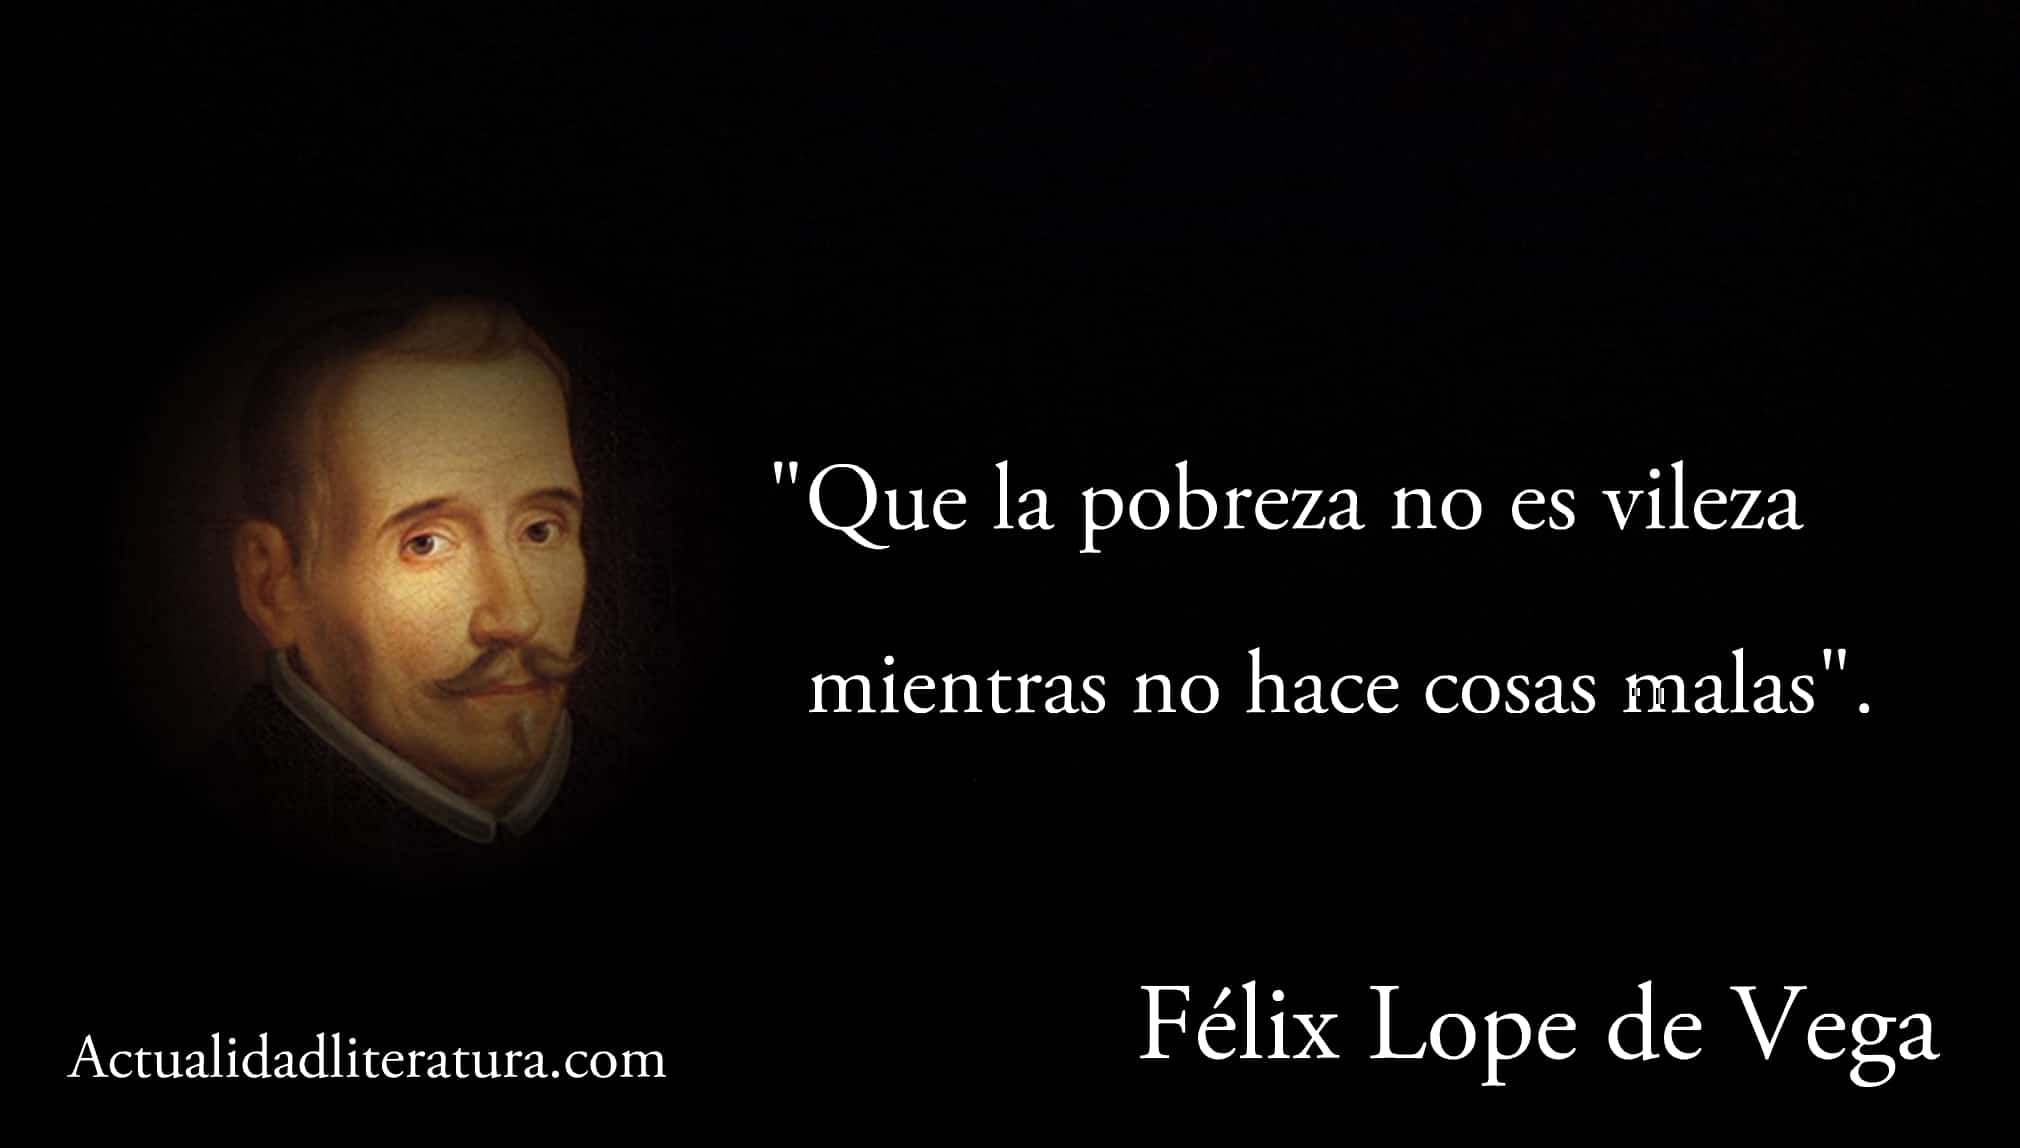 Frase de Félix Lope de Vega.